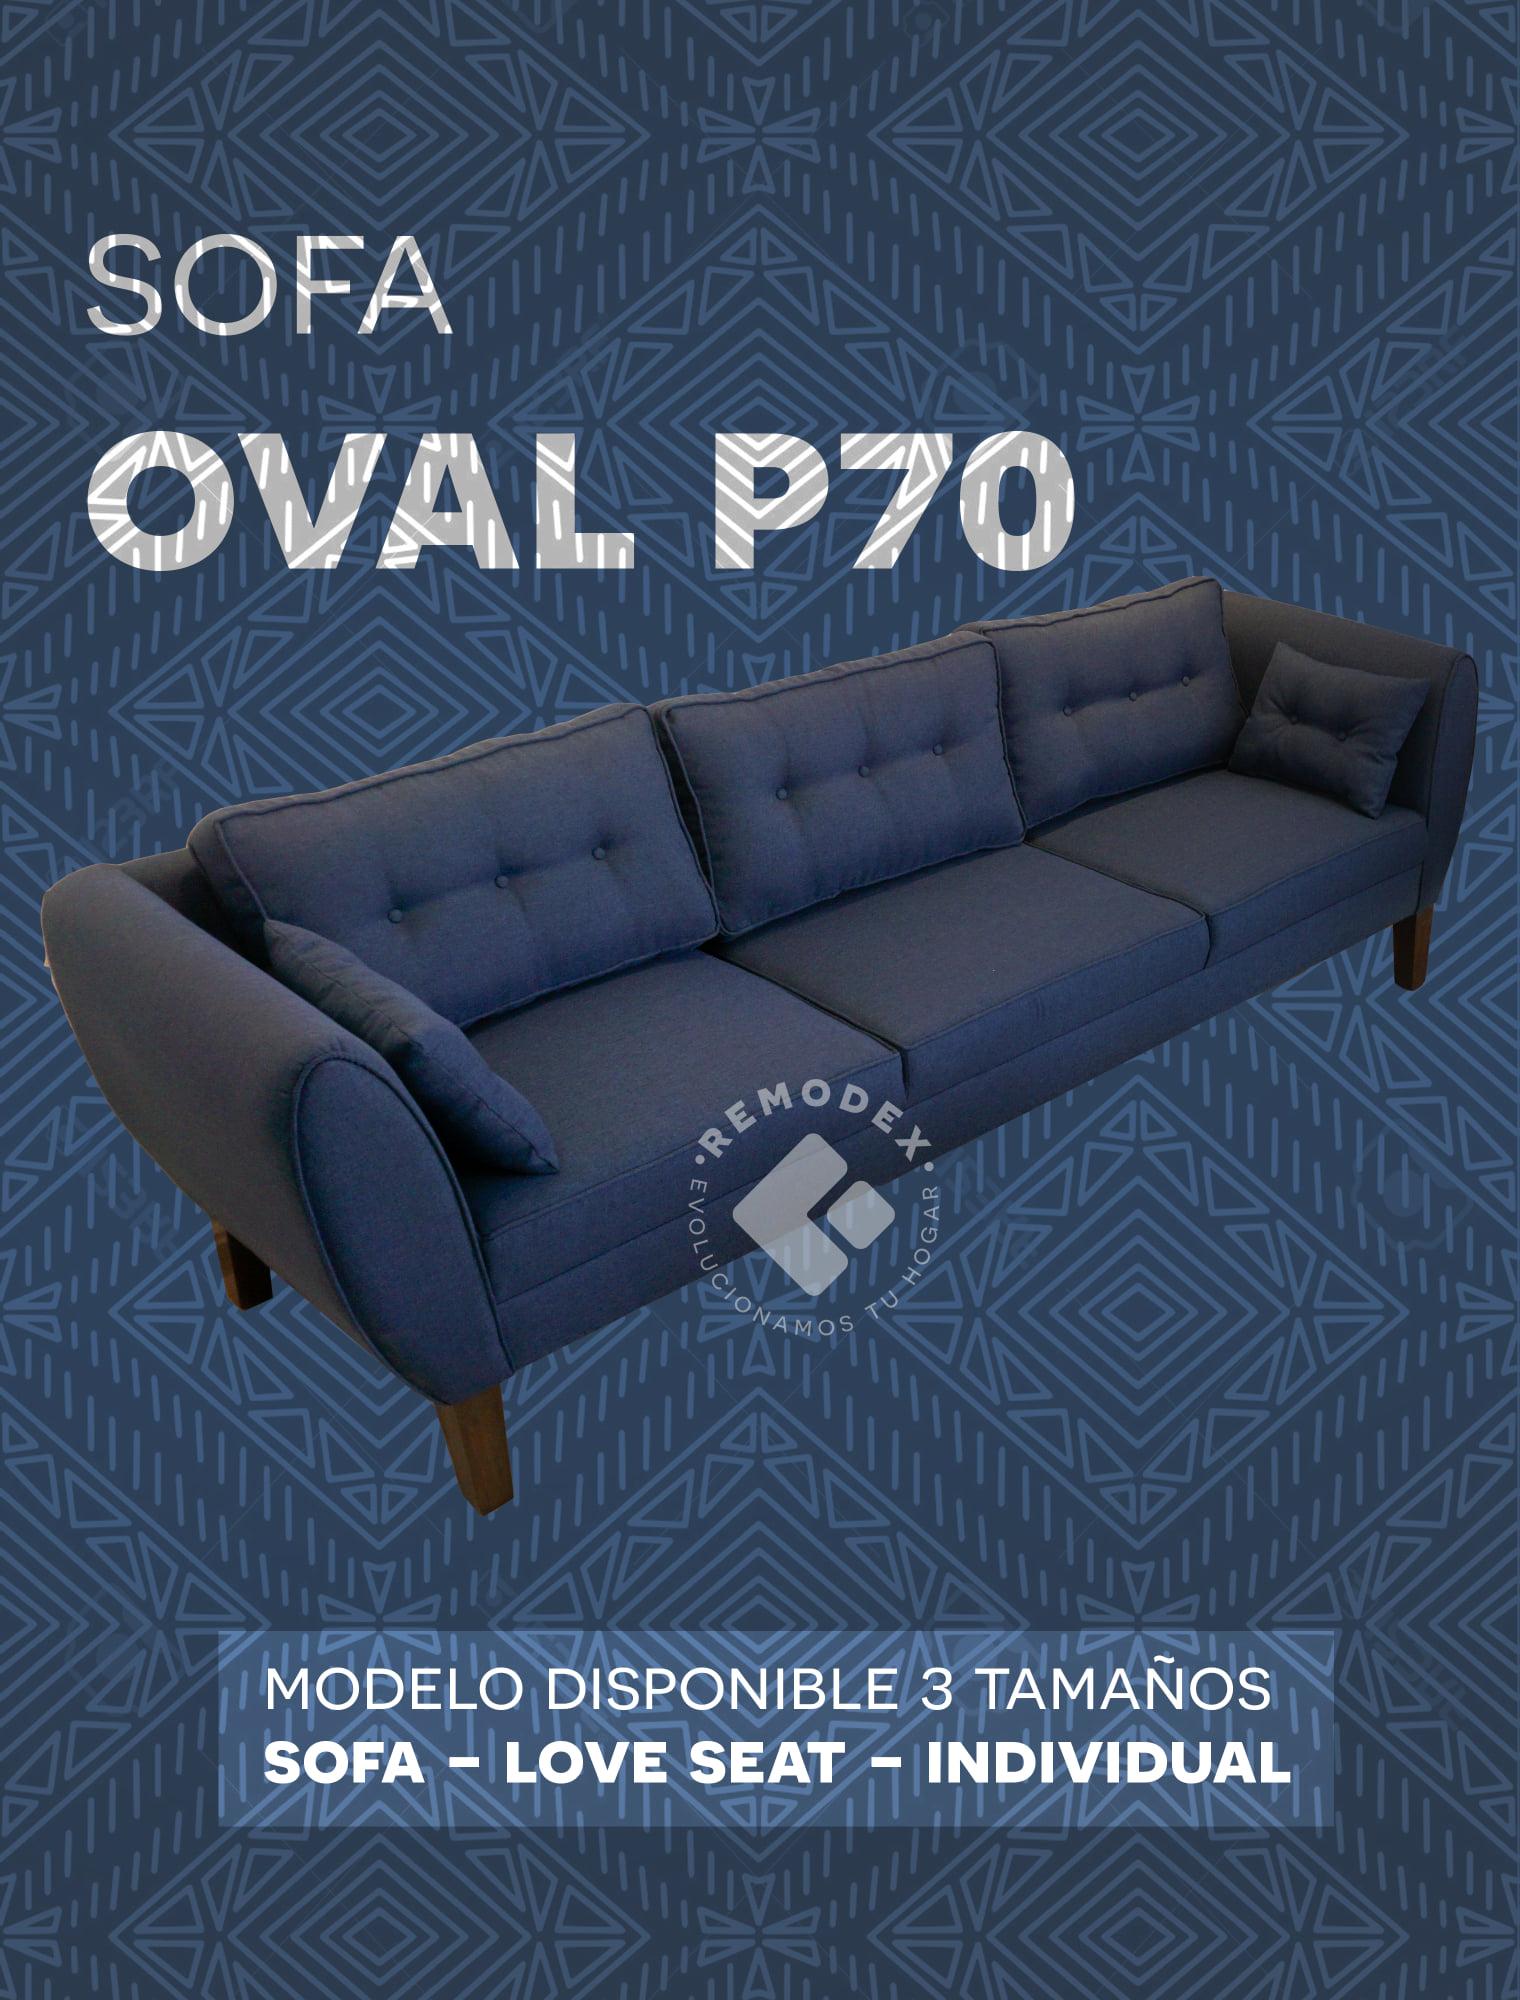 SOFÁ OVAL P70